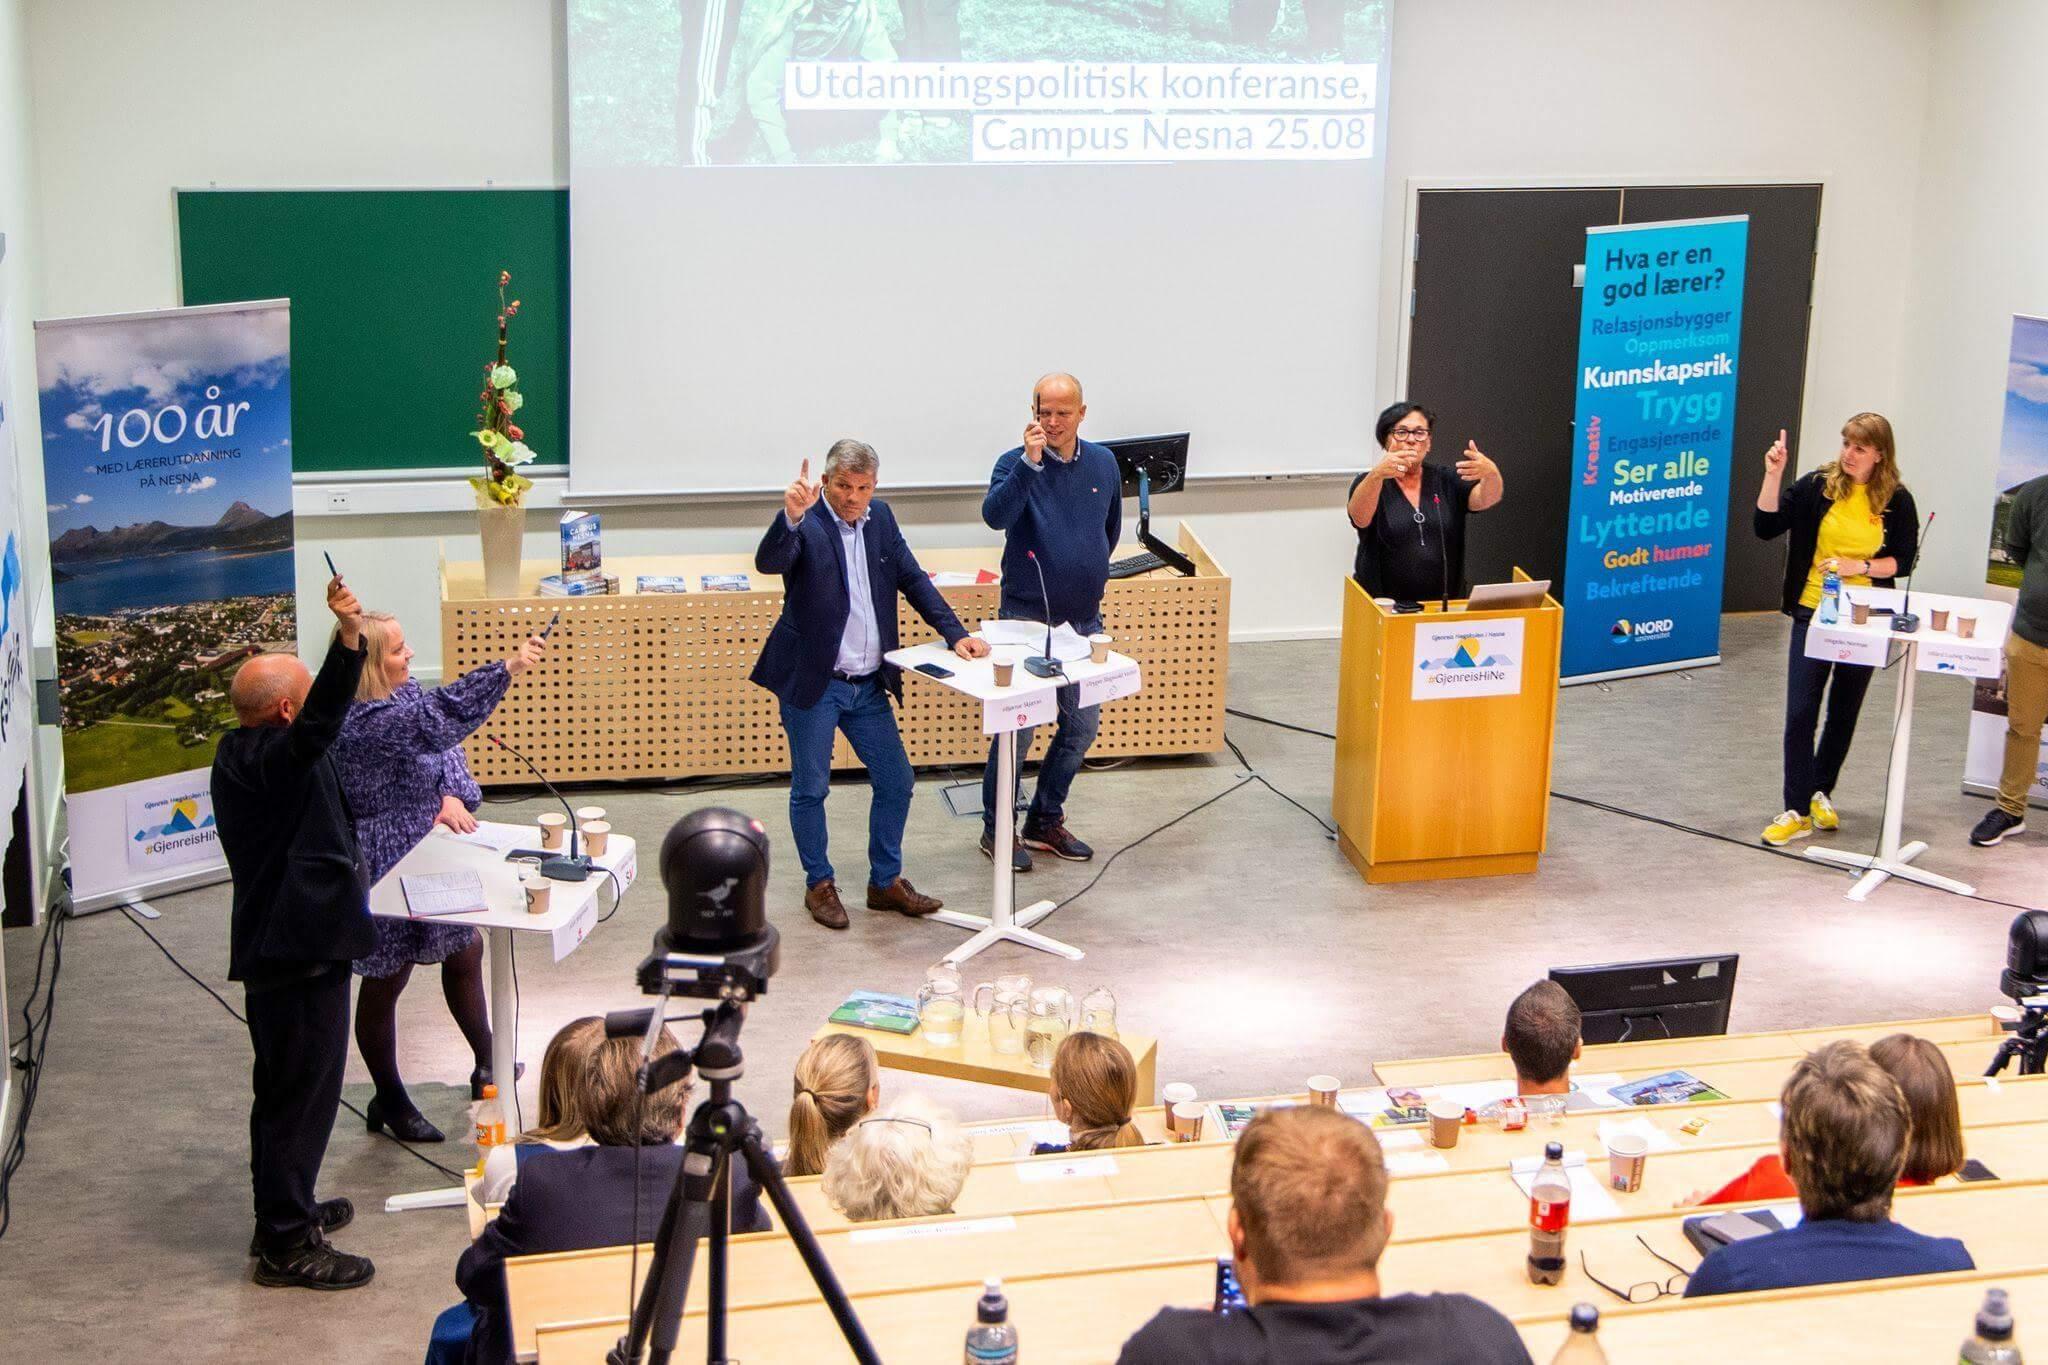 Foto: Hans Petter Sørensen, FarOutFocus